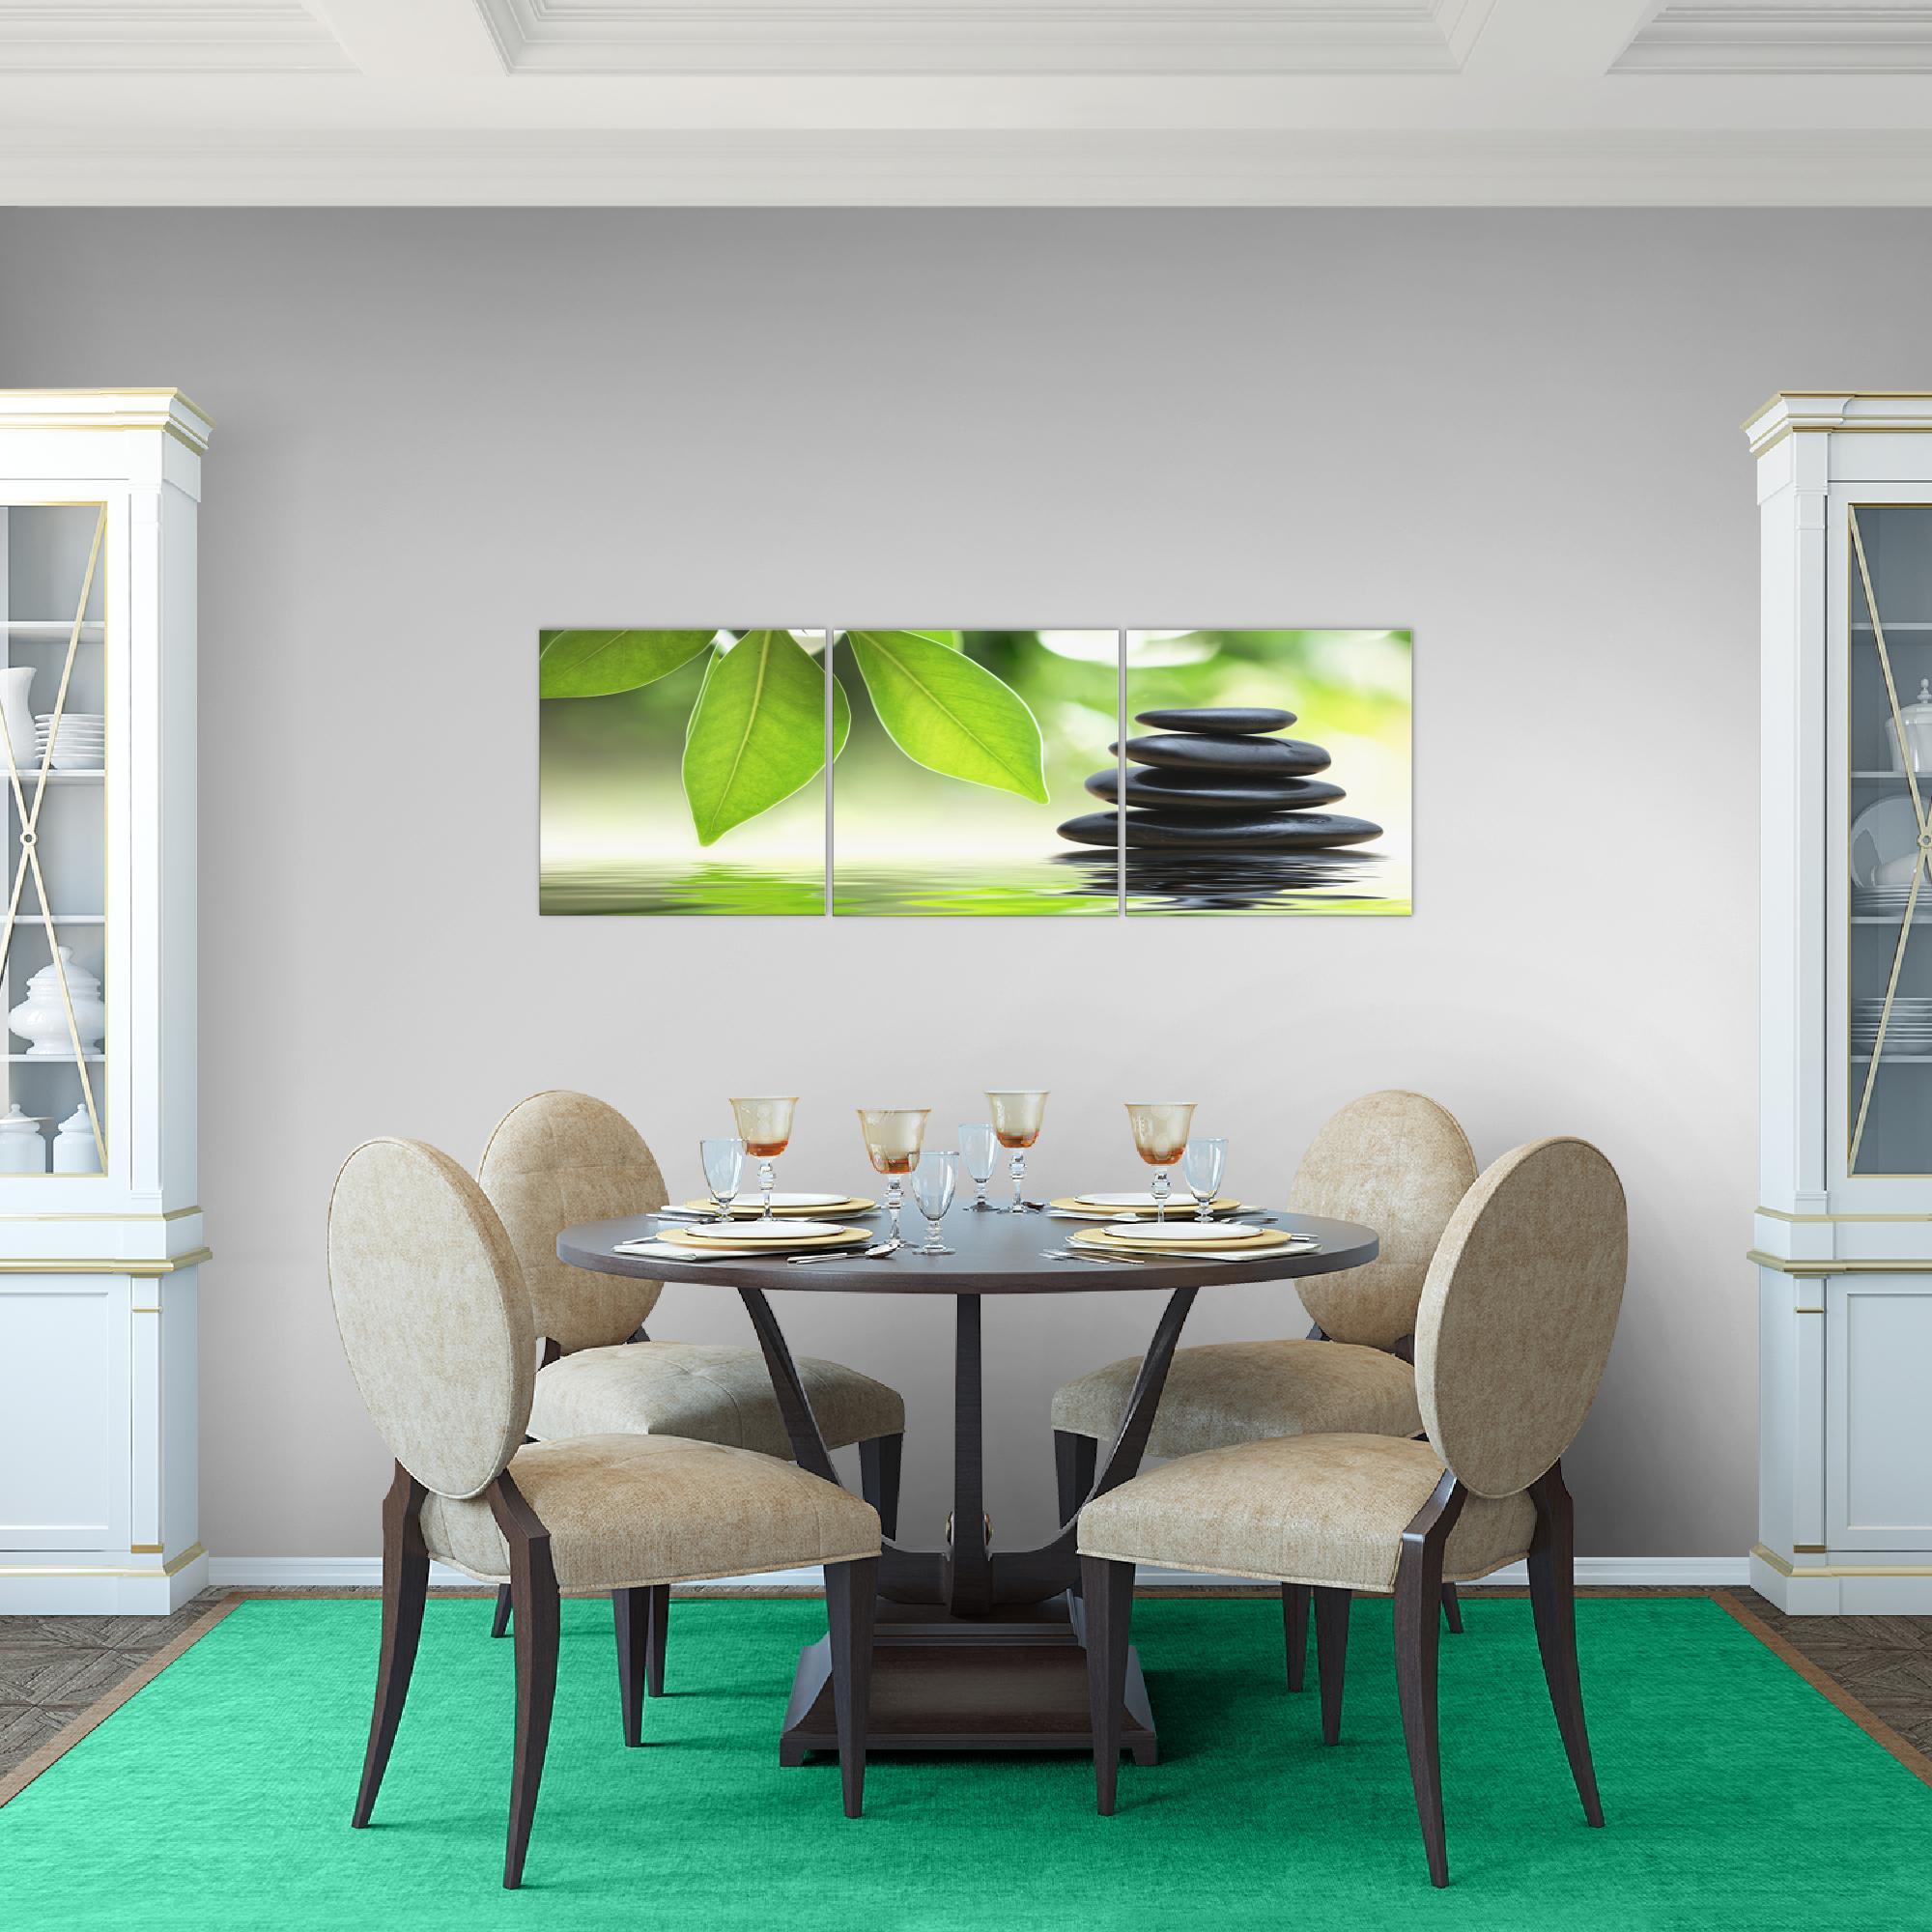 bild feng shui auf vlies leinwand xxl bilder wandbild. Black Bedroom Furniture Sets. Home Design Ideas